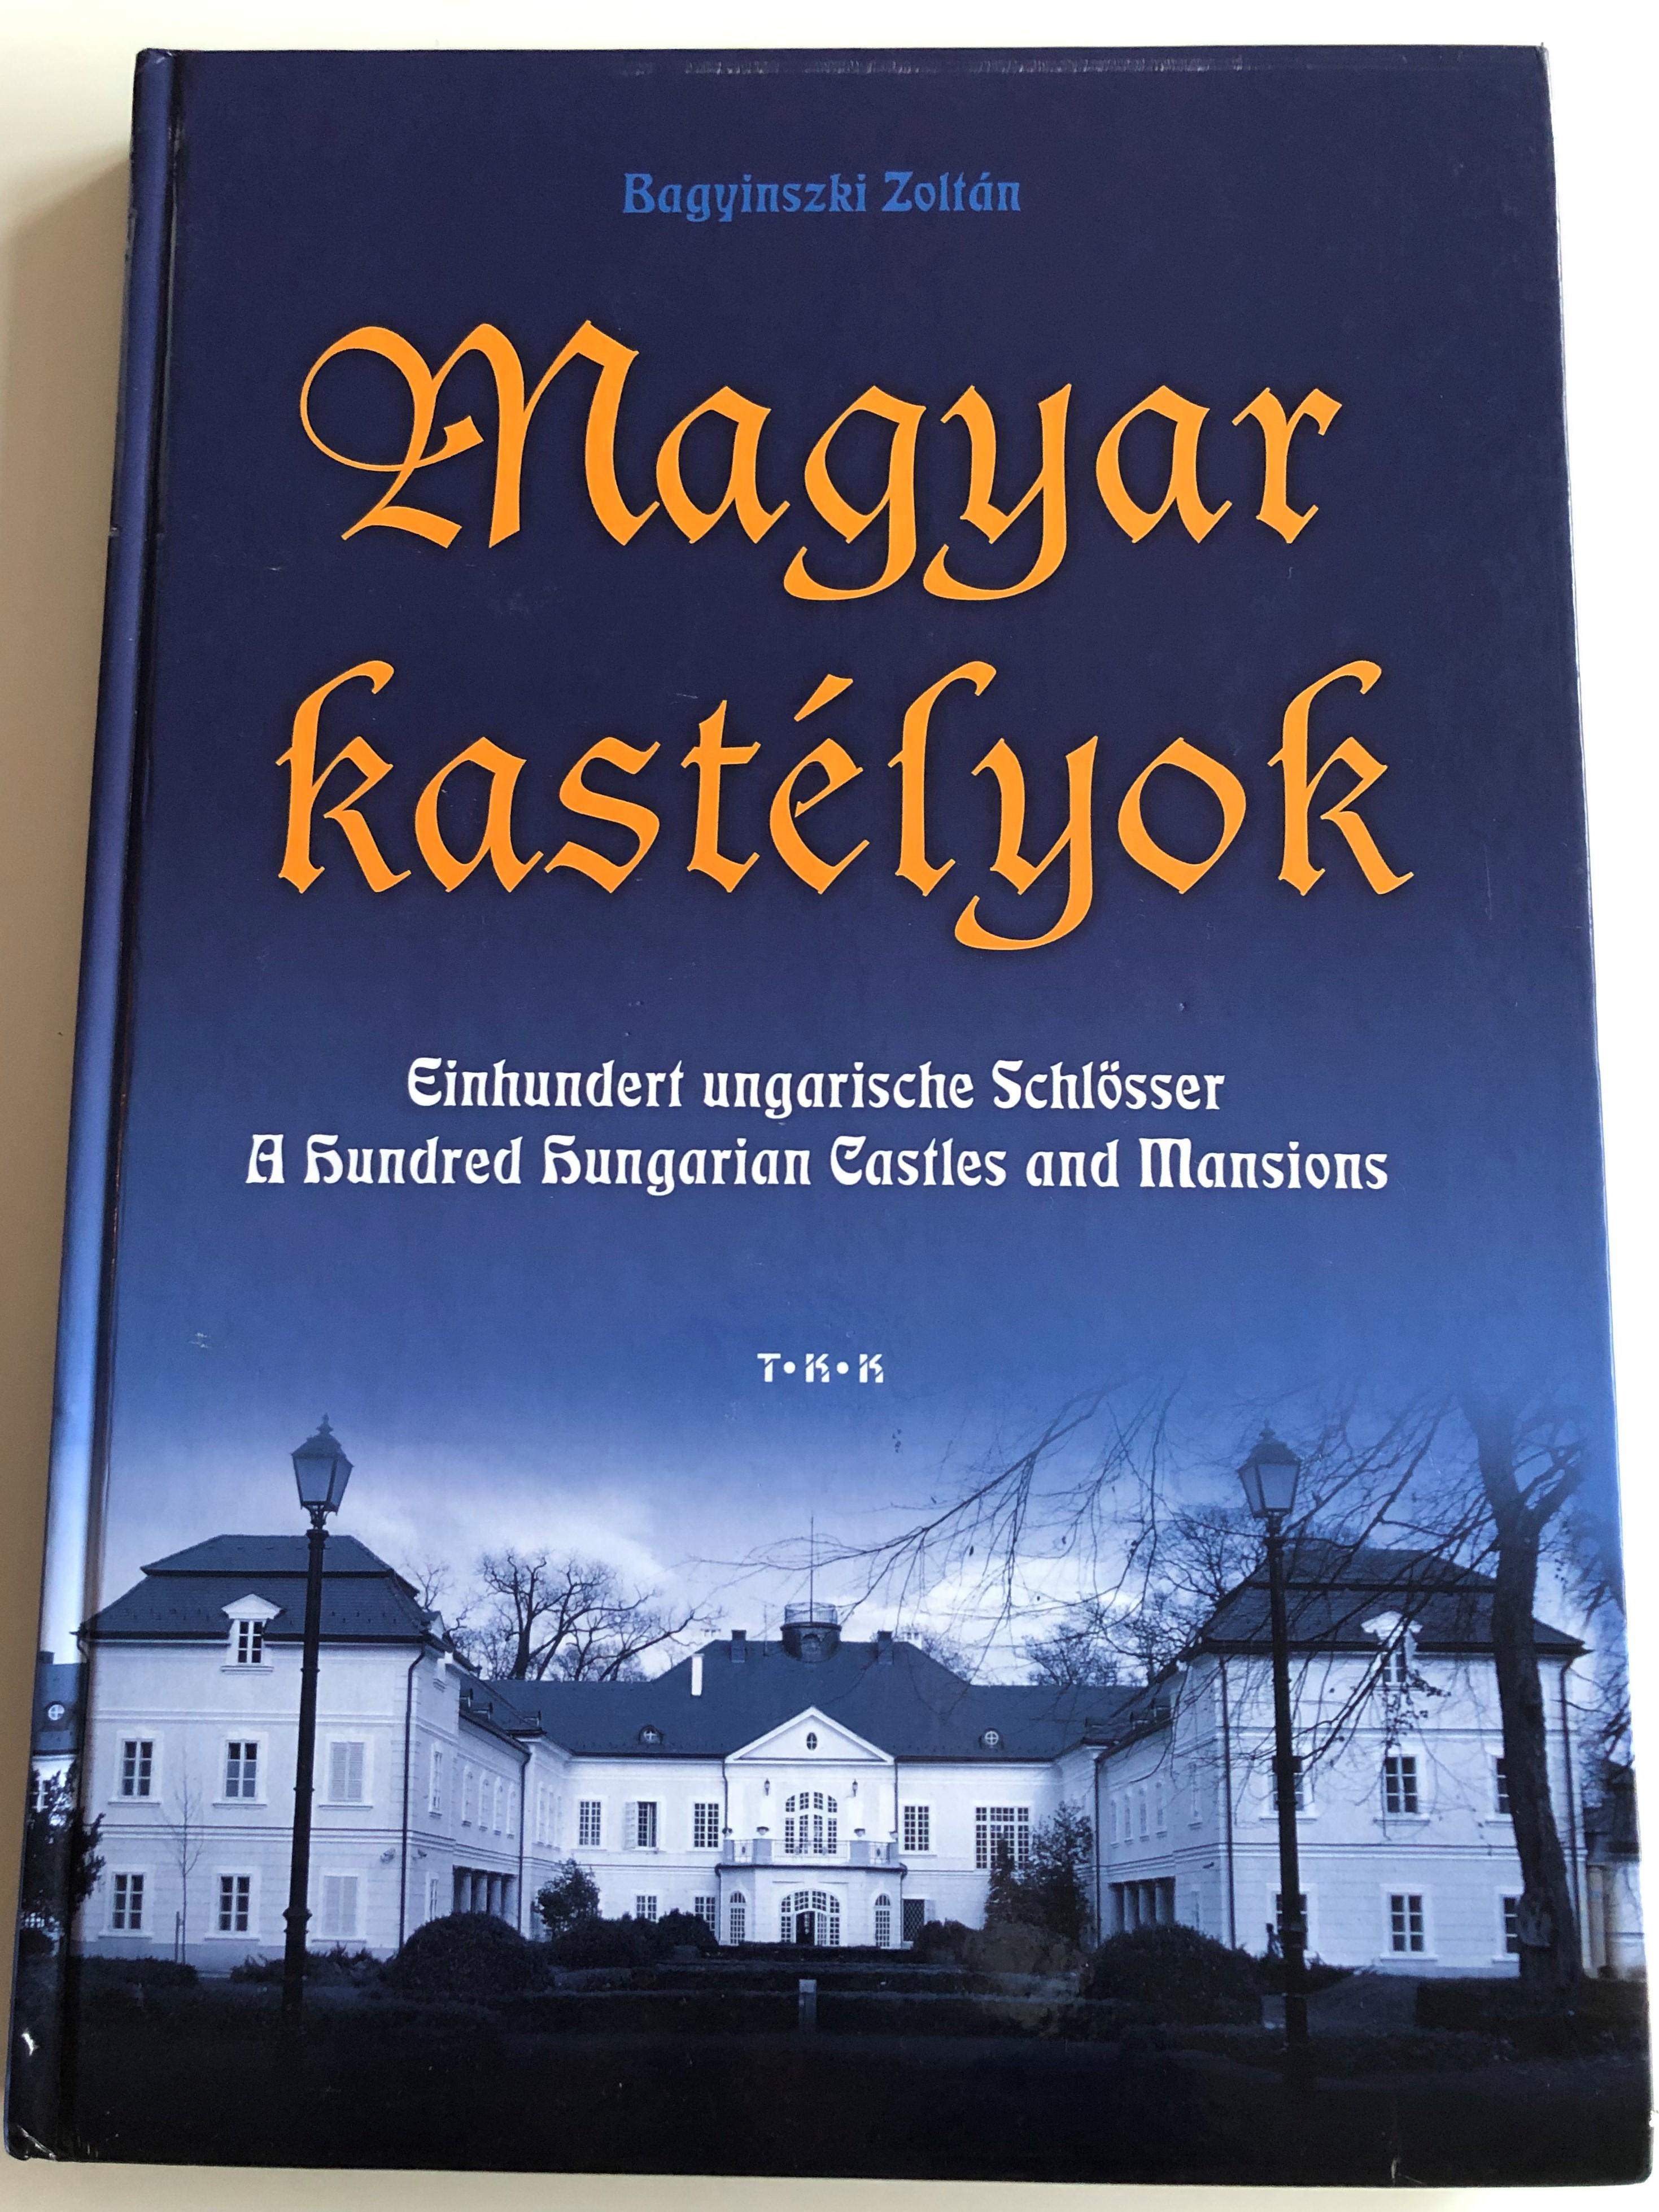 magyar-kast-lyok-by-bagyinski-zolt-n-one-hundred-hungarian-castles-and-mansions-1.jpg